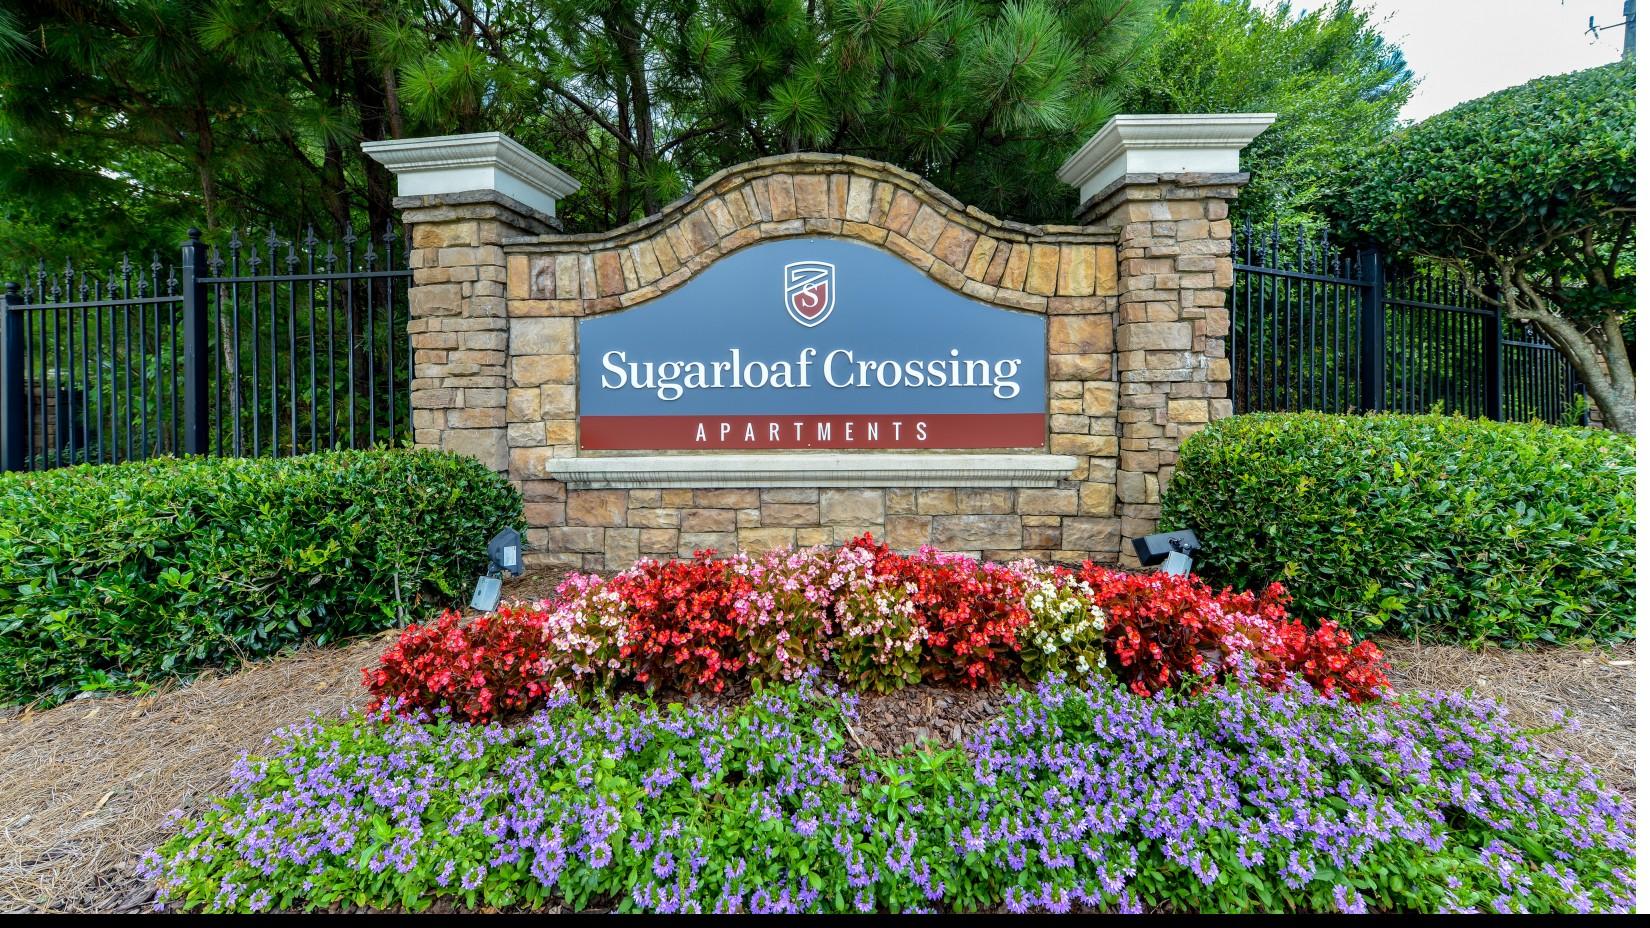 Sugarloaf Crossing